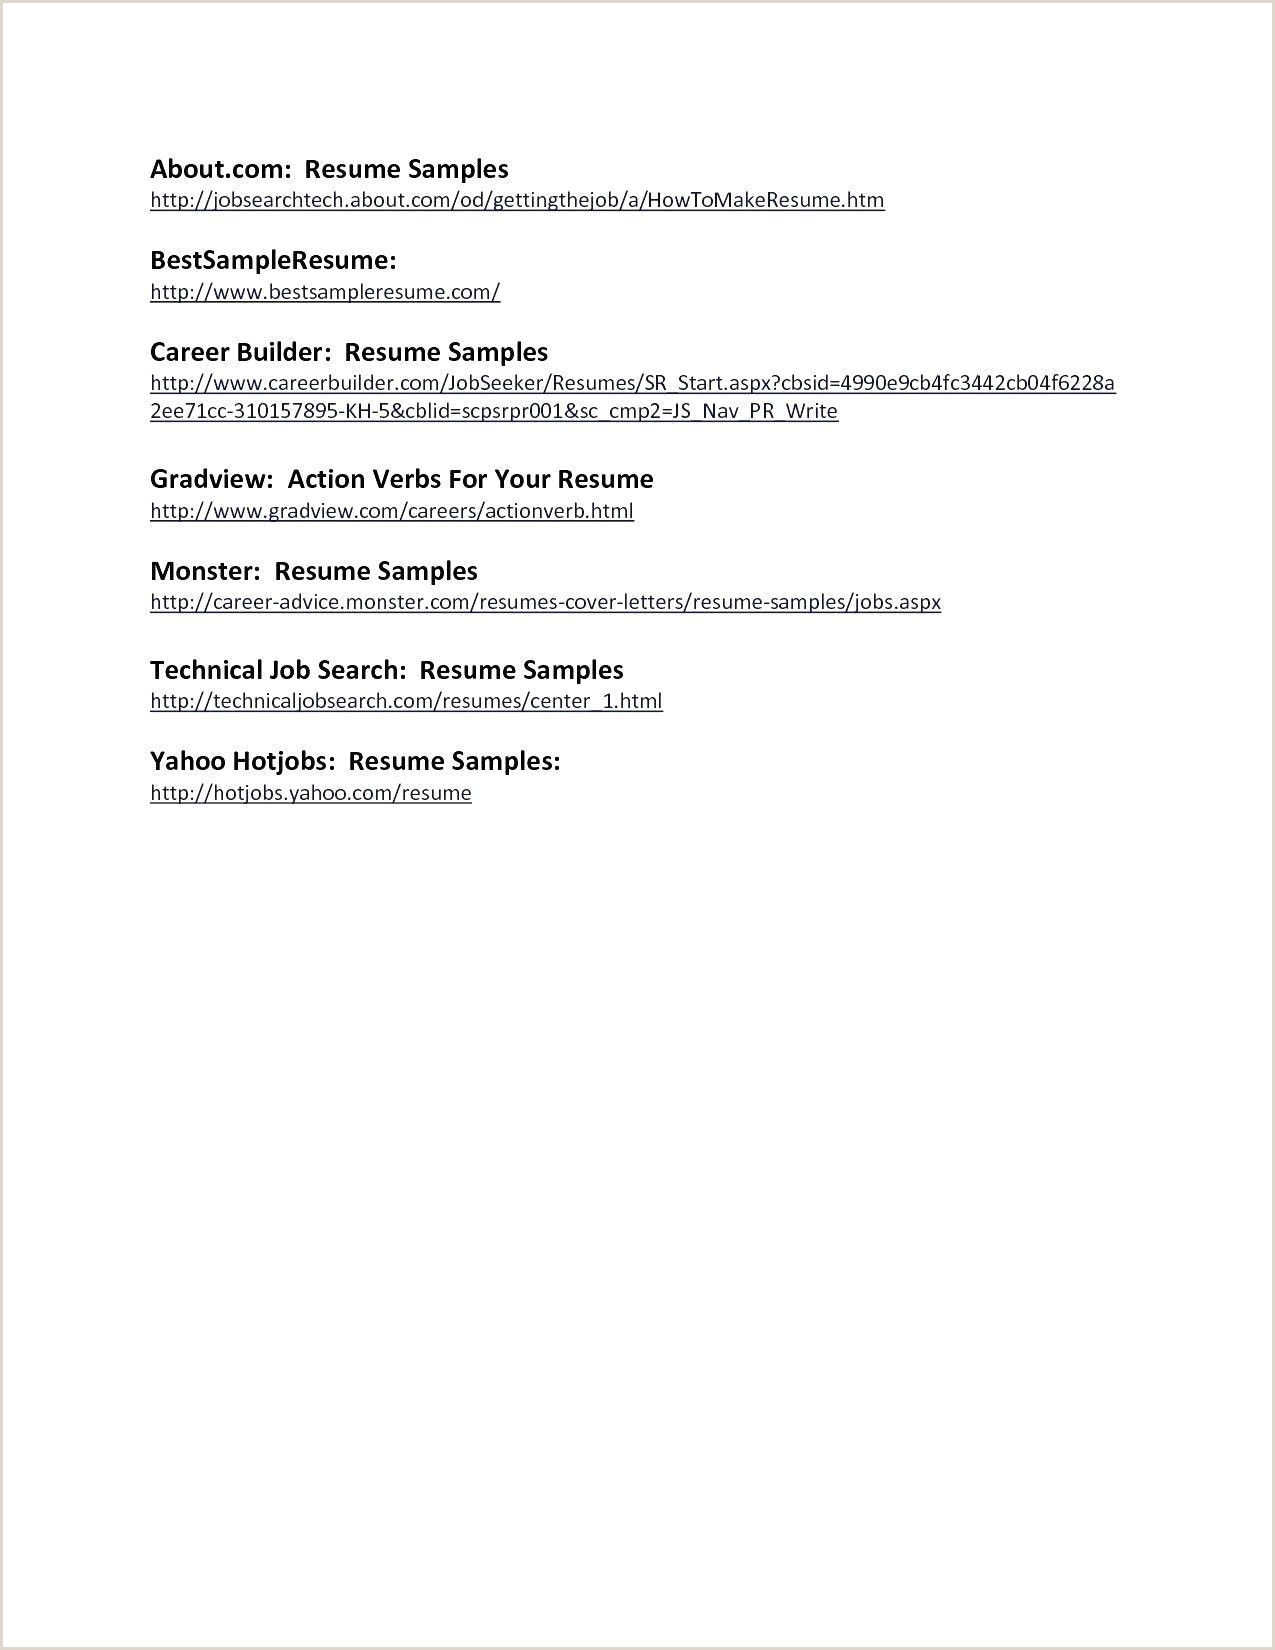 Curriculum Vitae Para Rellenar En Blanco Plantillas De Curriculum Vitae Para Rellenar Y Imprimir